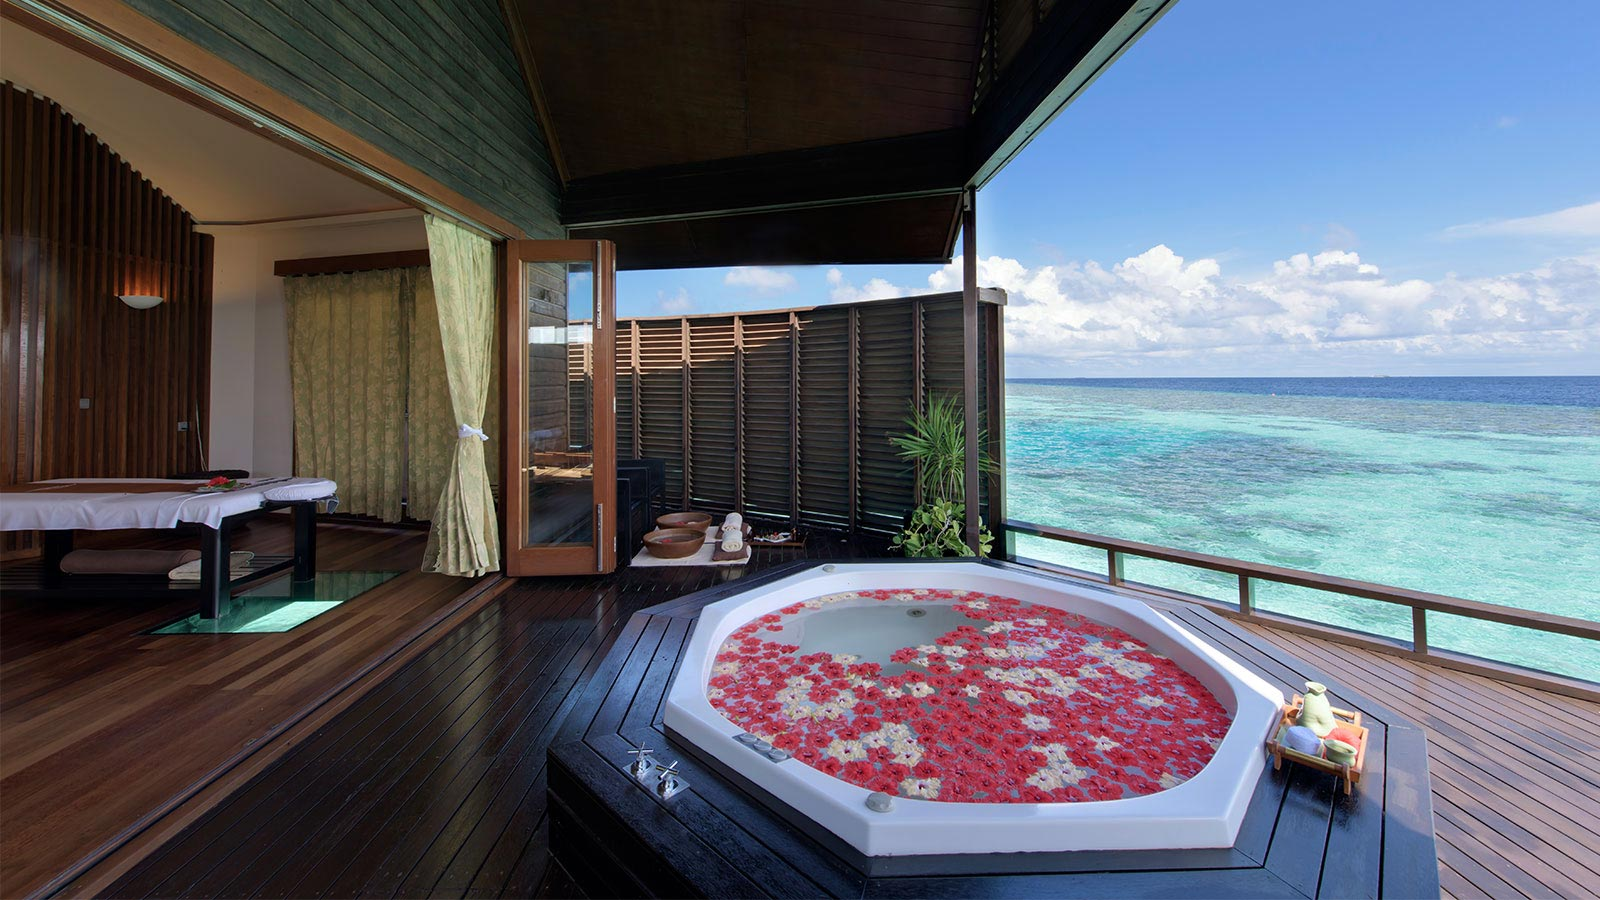 Honeymoon Decoration In Maldives : Maldives Honeymoon - Honeymoon Maldives